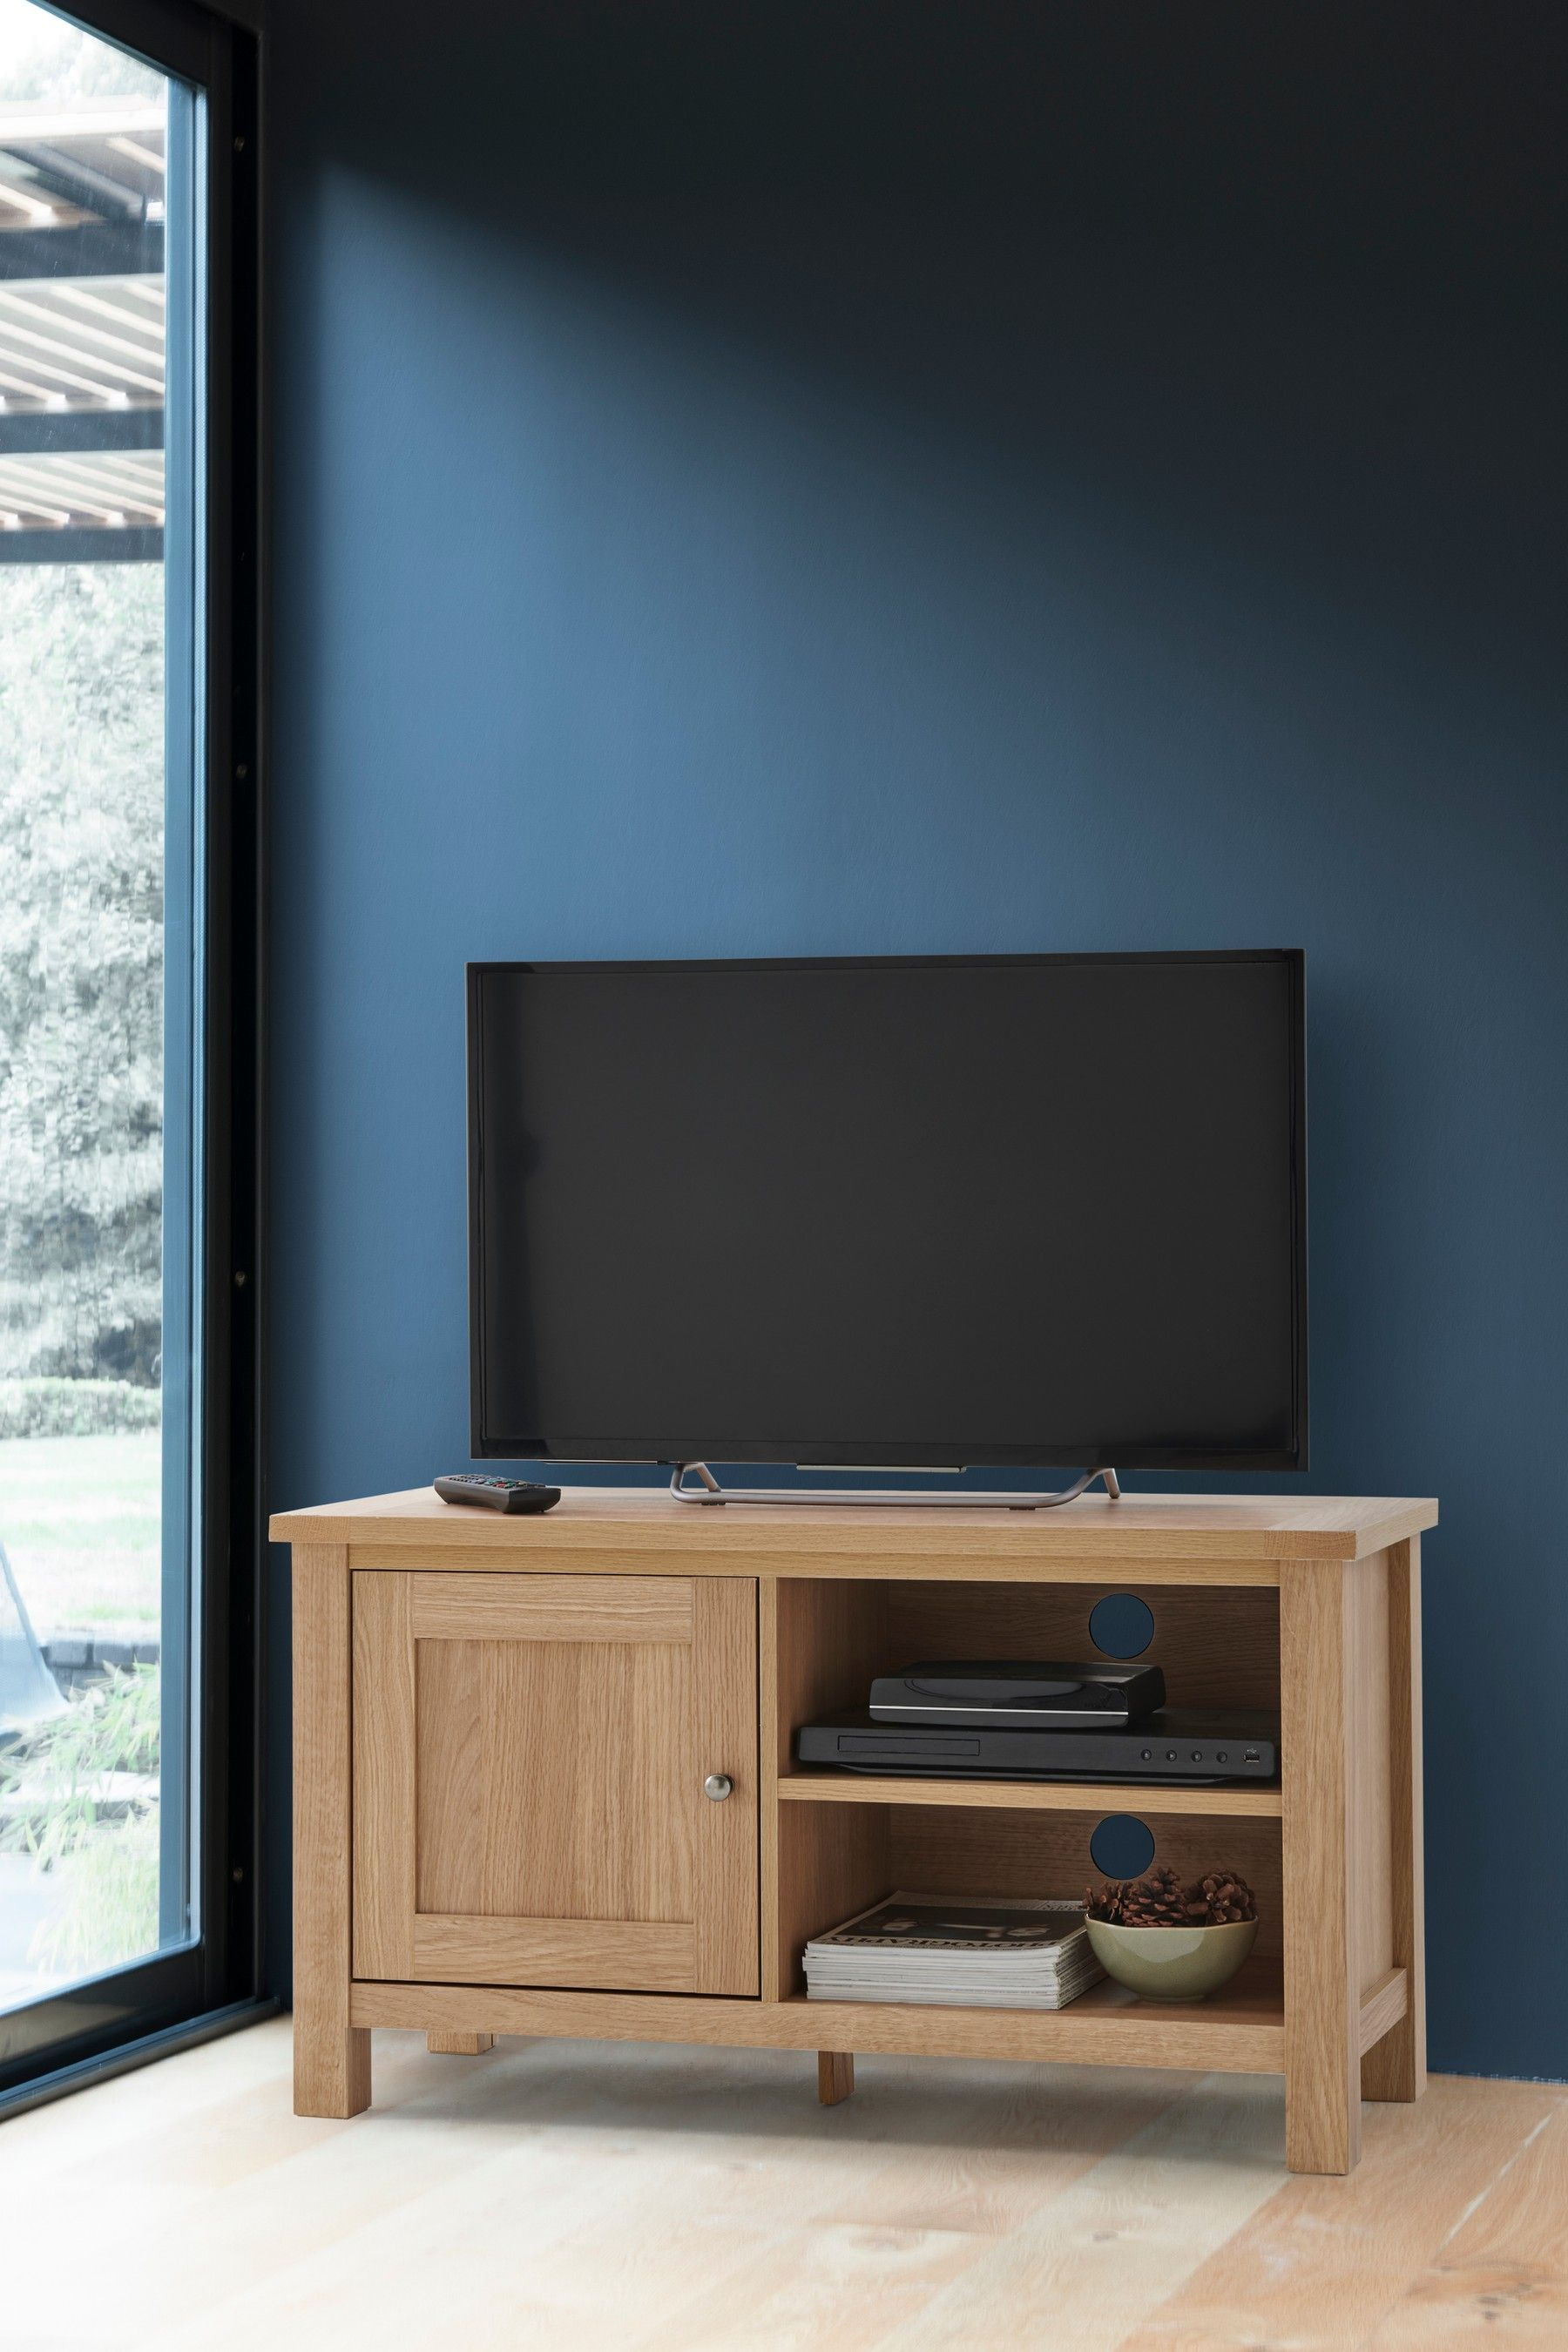 Next Malvern Cream Tv Stand Cream Tv Stand Cream Furniture Collection Furniture